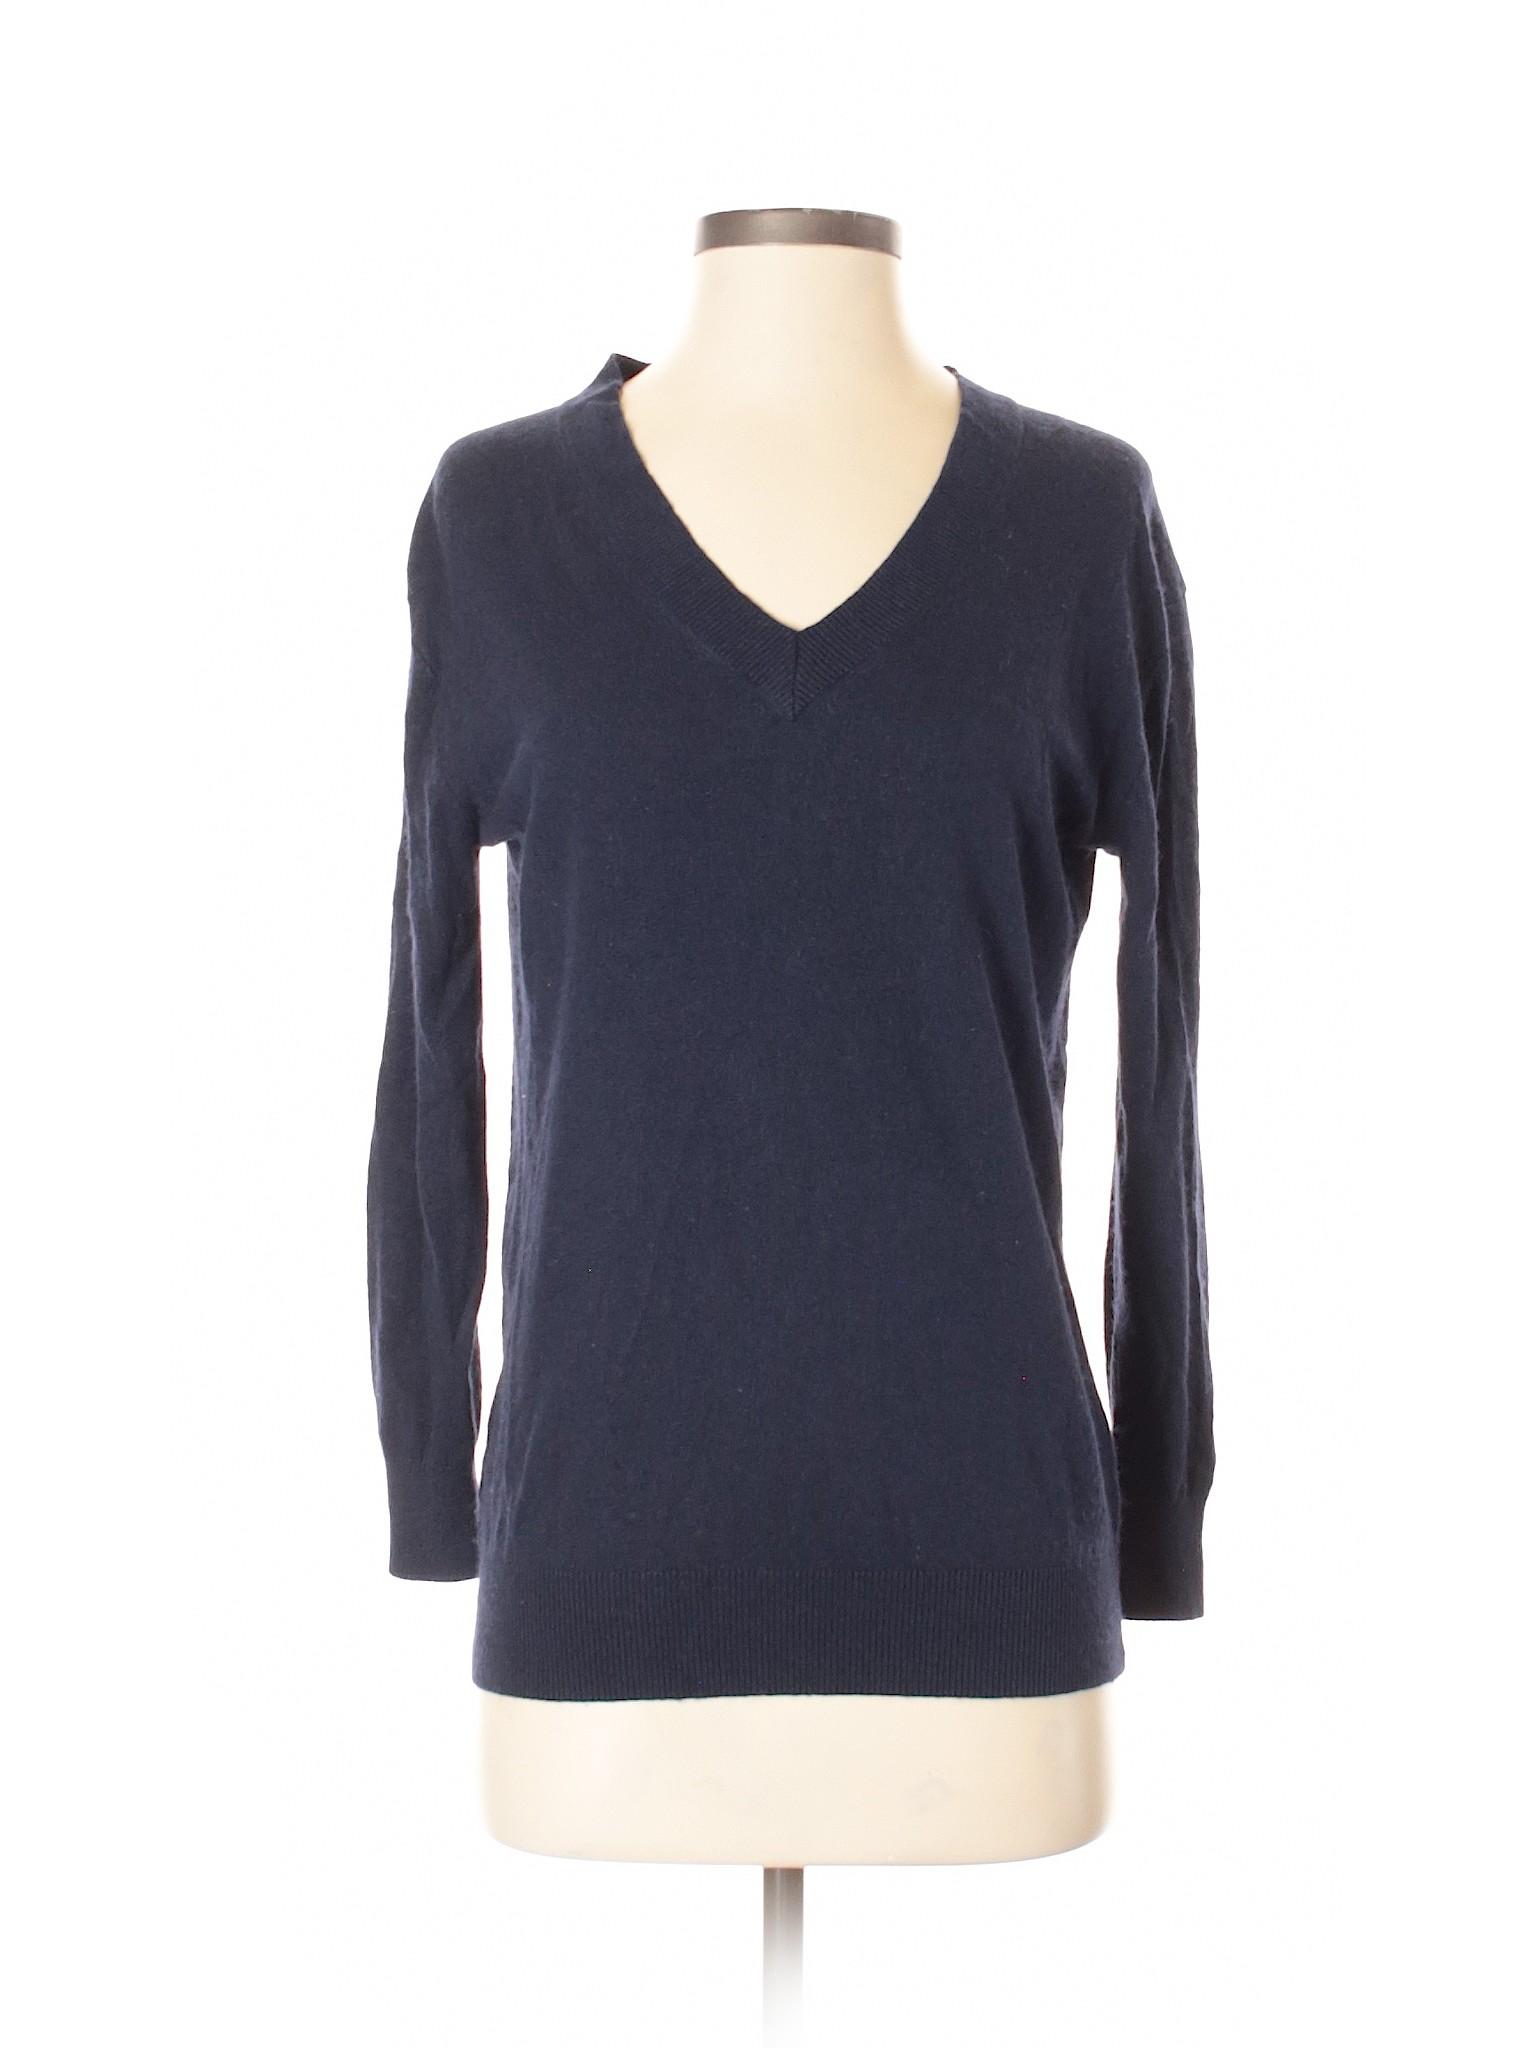 International winter Boutique Sweater Pullover Silk Moda EqOpvvwxU0